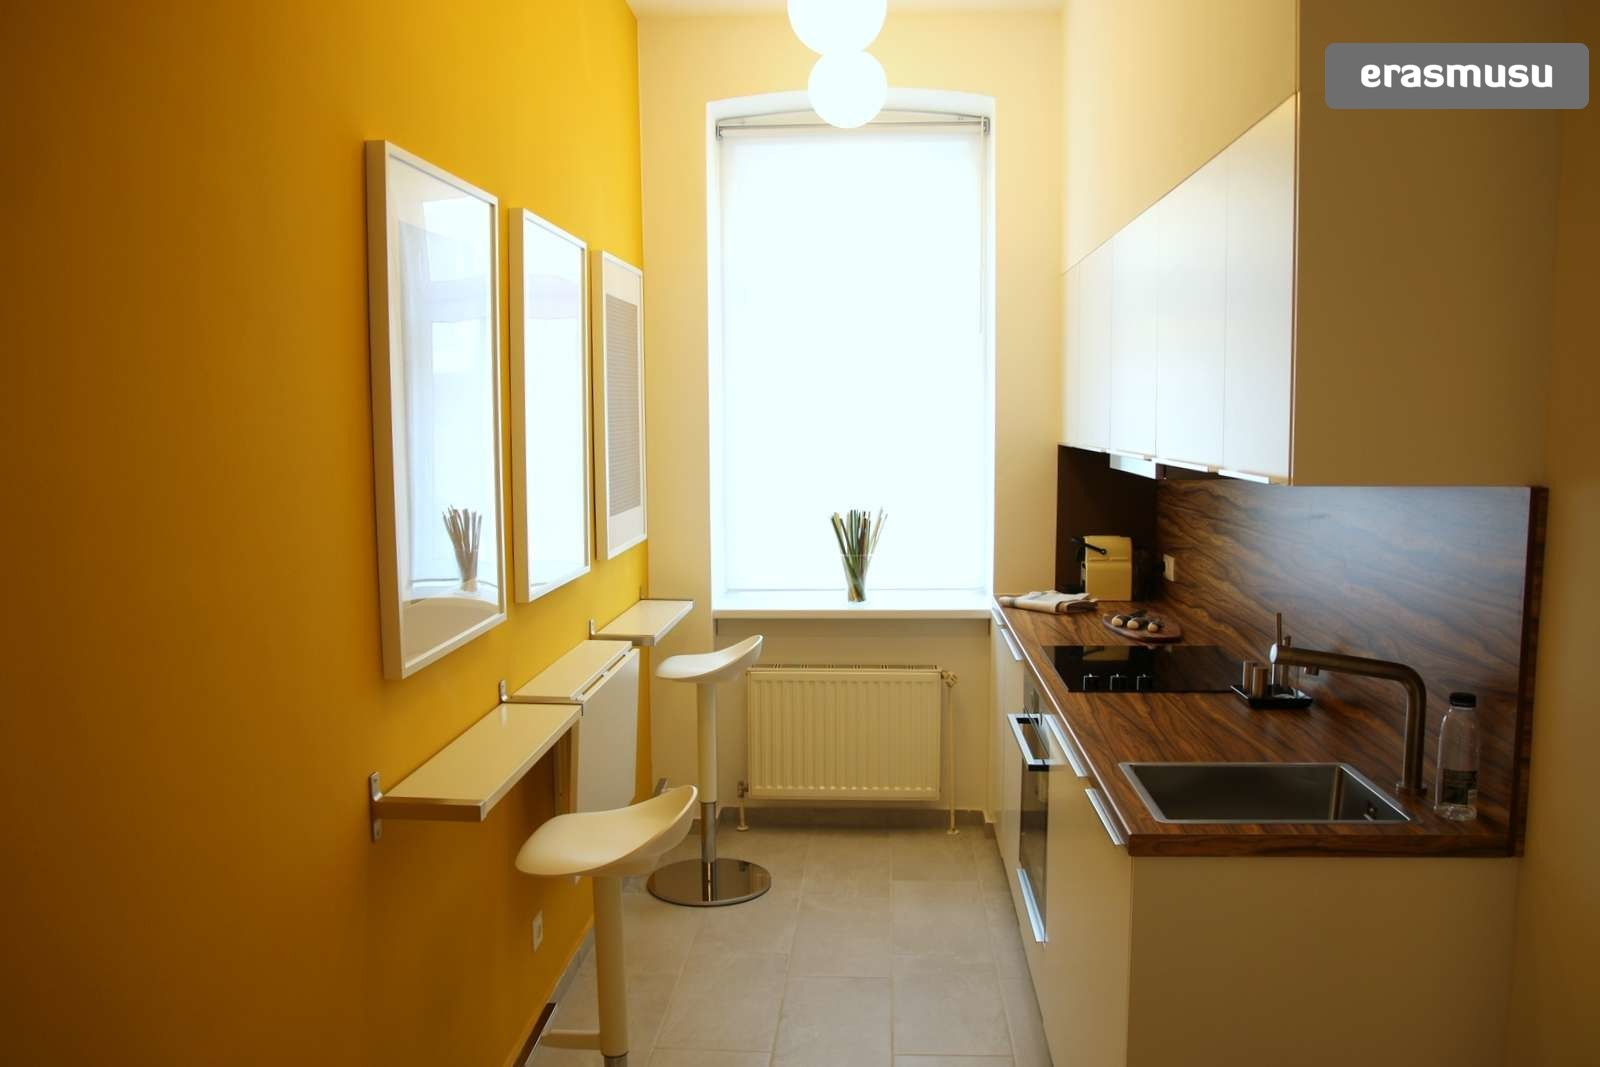 lovely-studio-apartment-rent-wahring-a929da5cee2732f42a3a46c4a2a